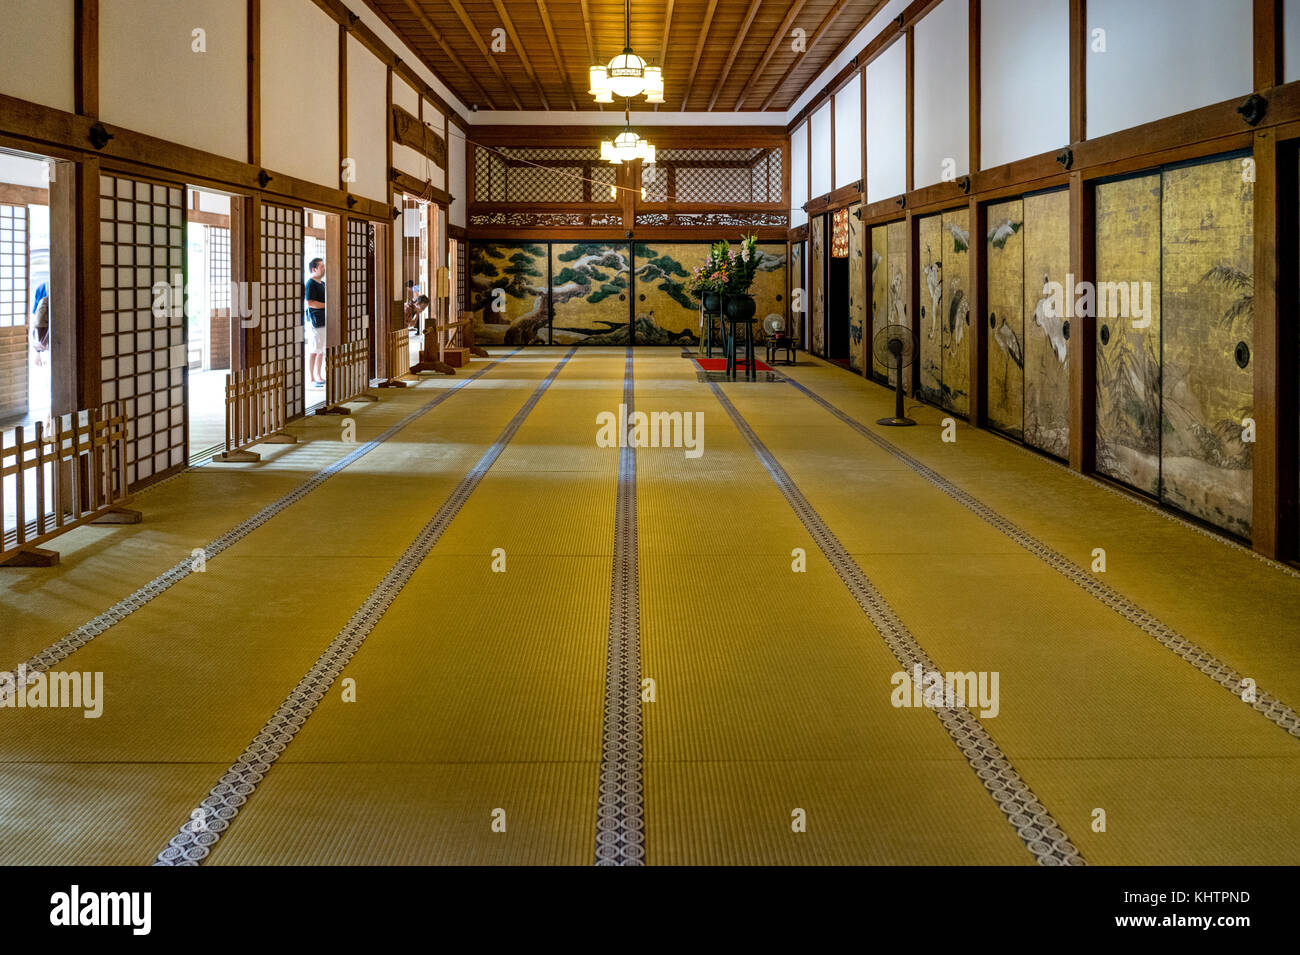 Japanische Bodenmatten house tatami stockfotos house tatami bilder